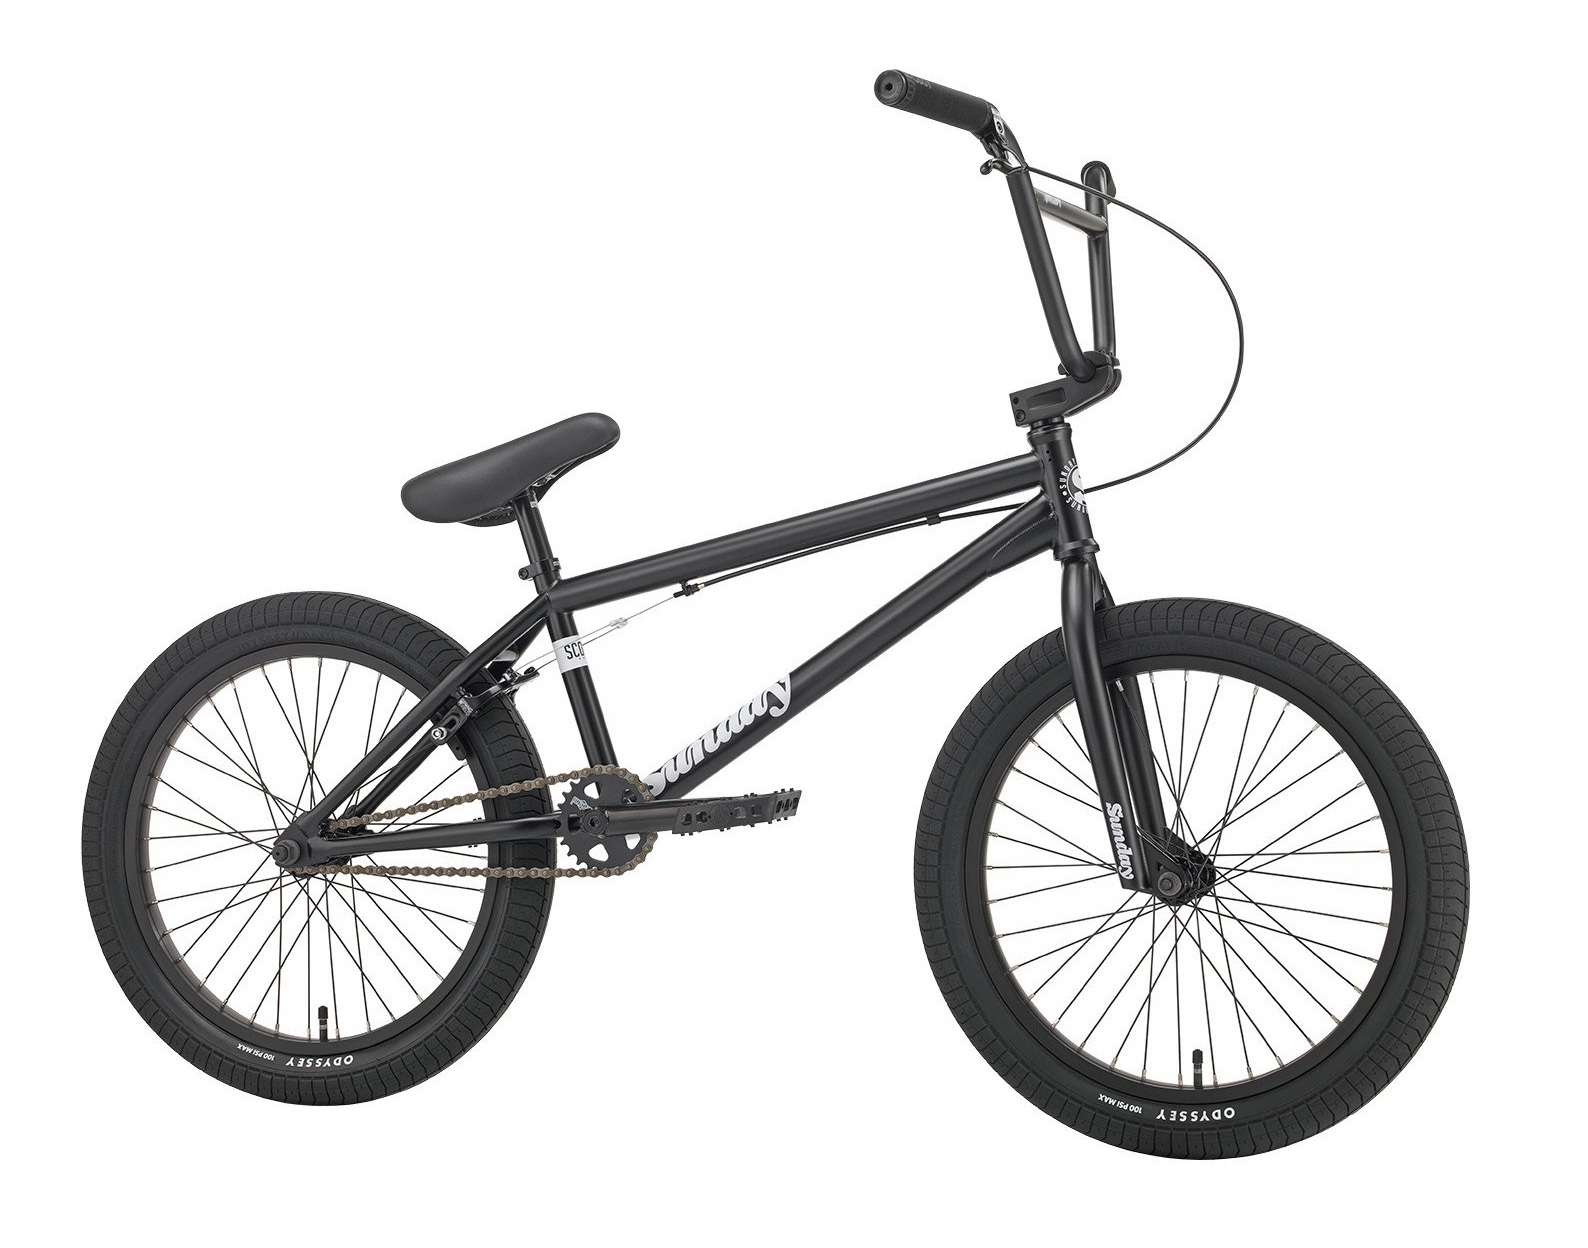 Bicicleta SUNDAY Scout 2018 $1'450.000